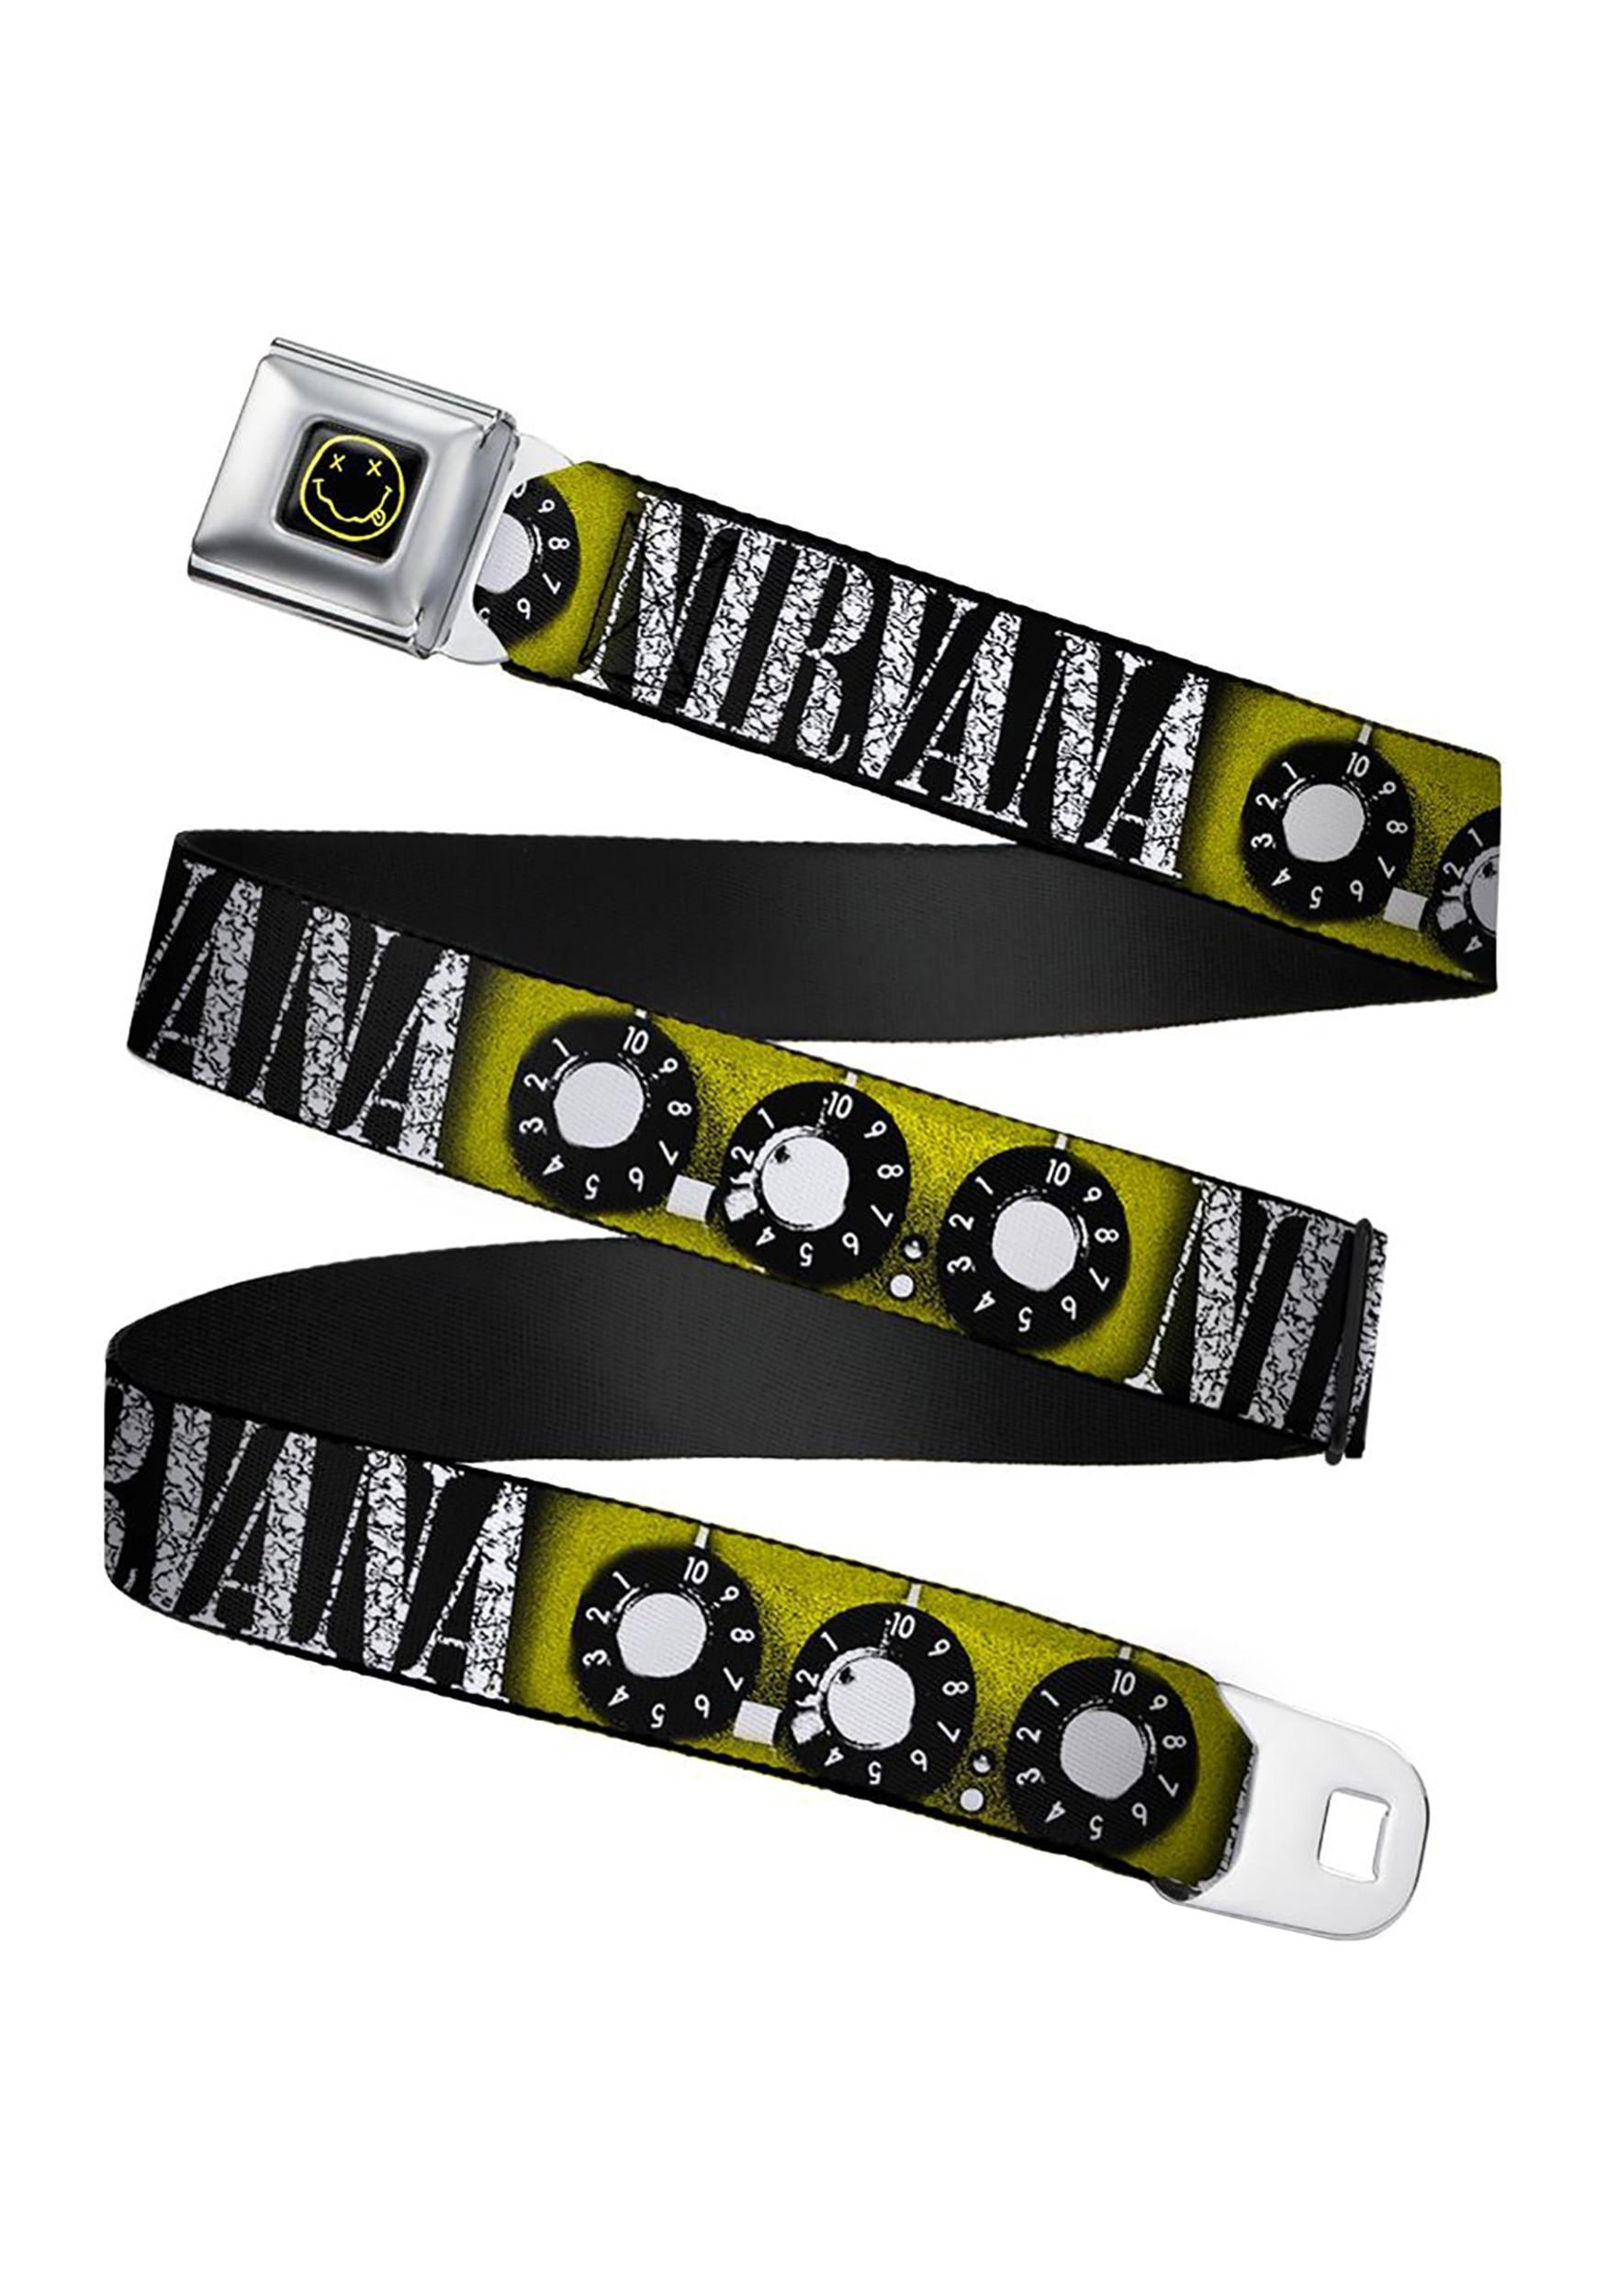 Nirvana Smiley Face Guitar Knobs Adult Seatbelt Buckle Belt